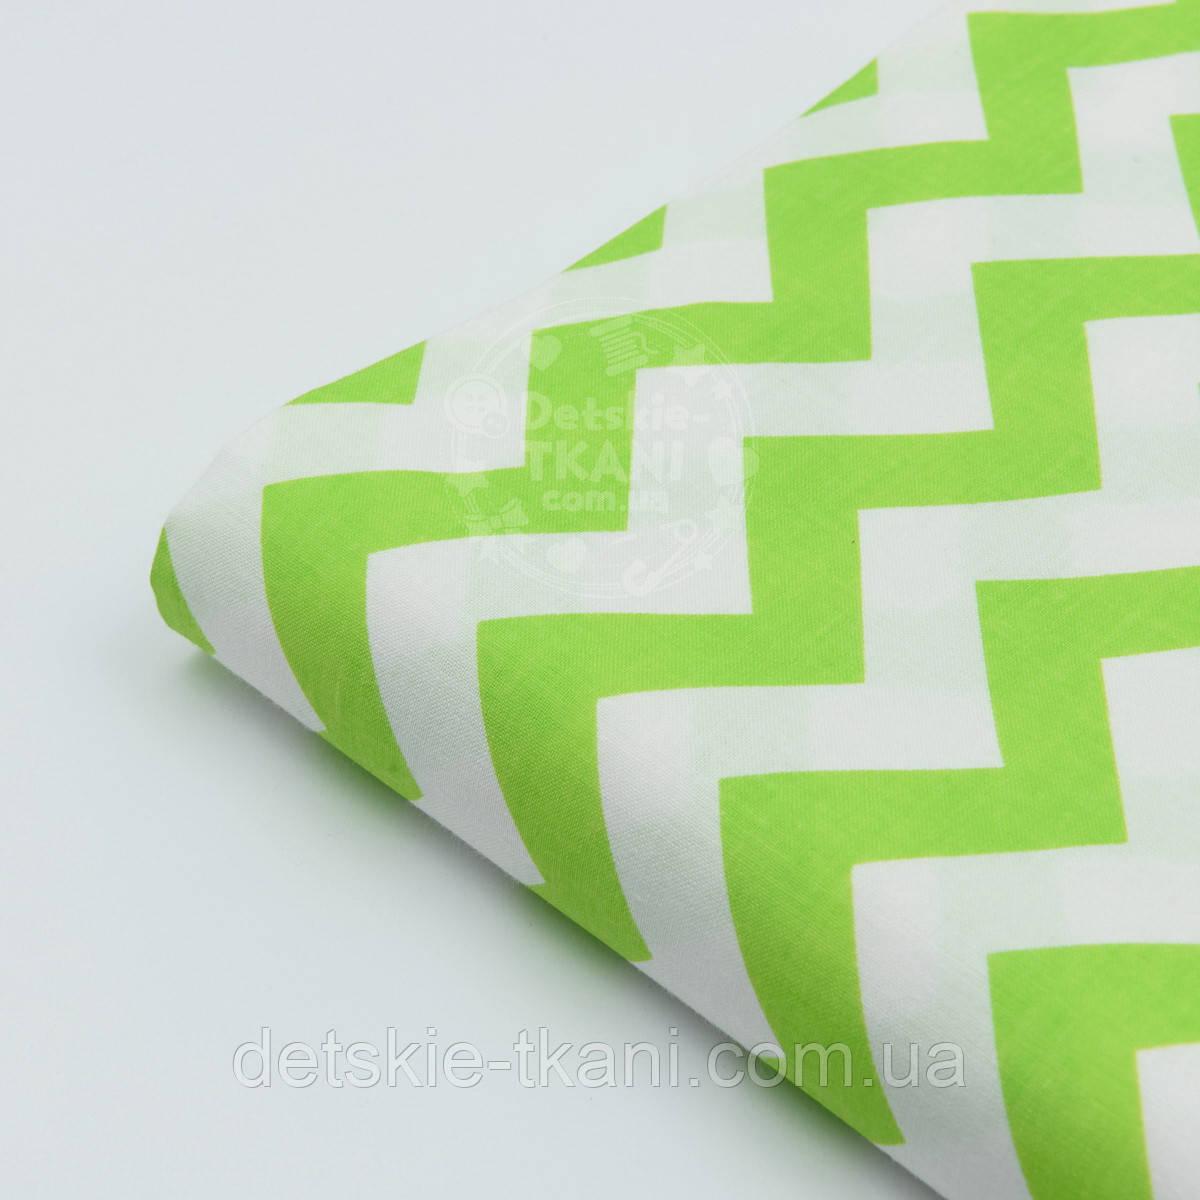 Лоскут ткани №311 размером 29*52см